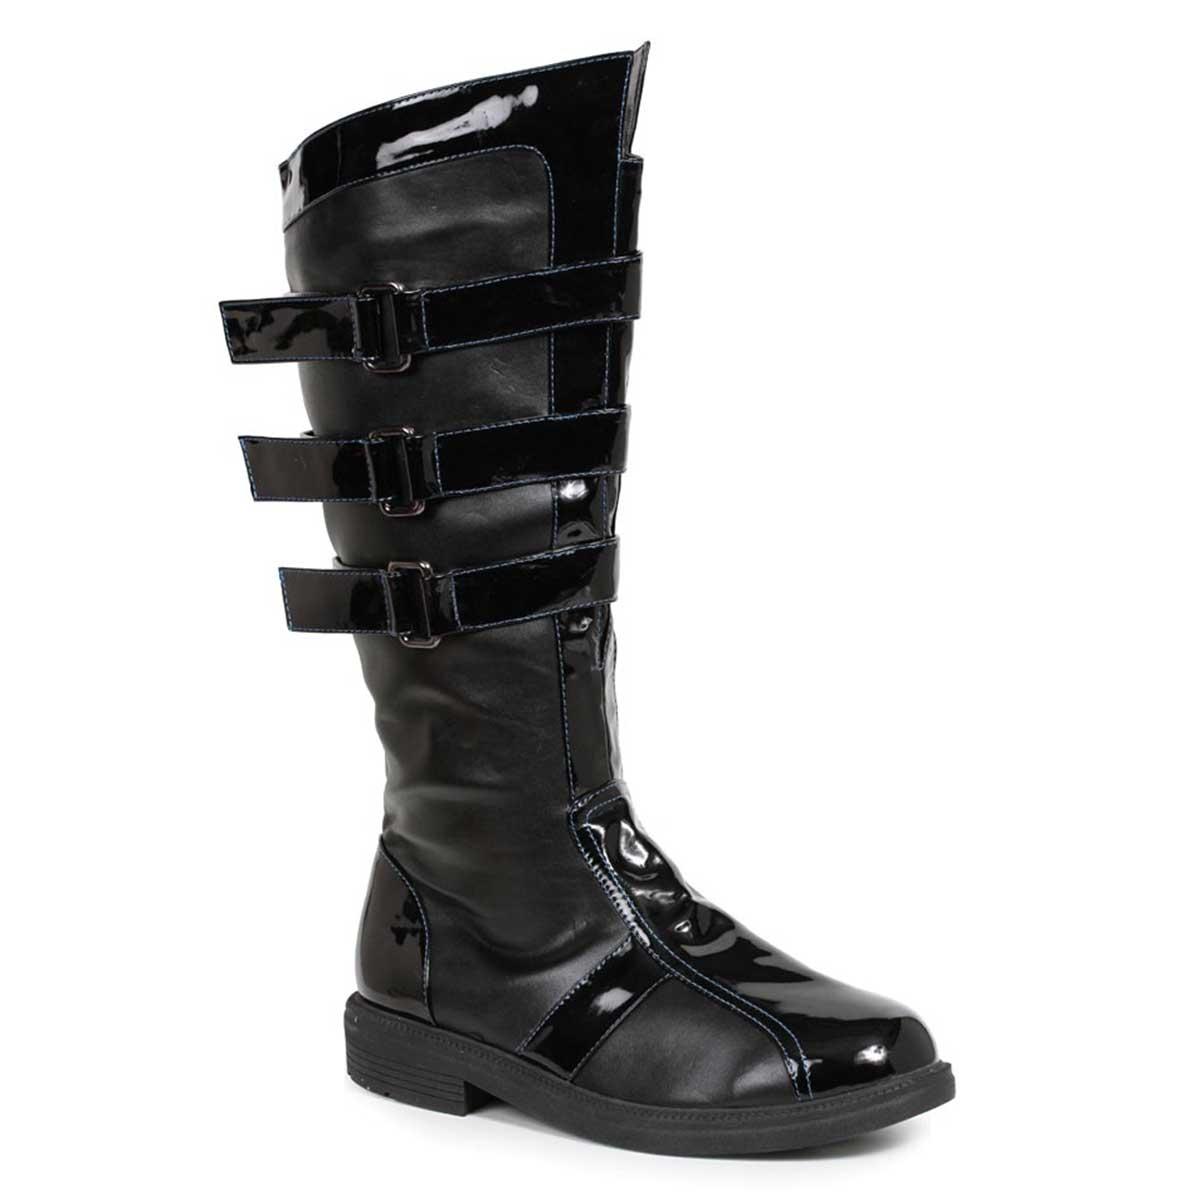 125 DARTH, Men Buckles Boots